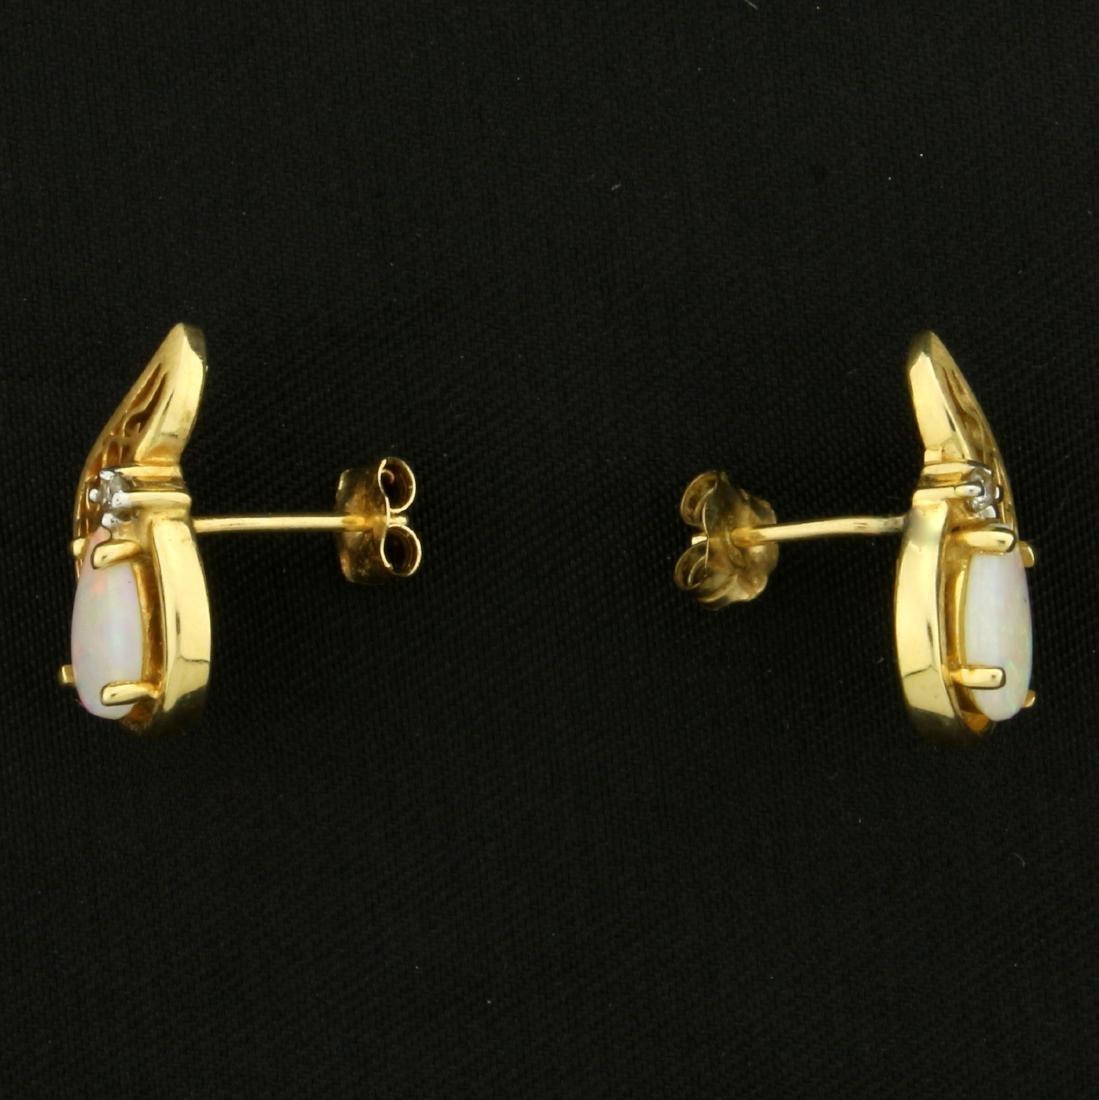 Pear Shaped Opal and Diamond Earrings in 14K Yellow - 2